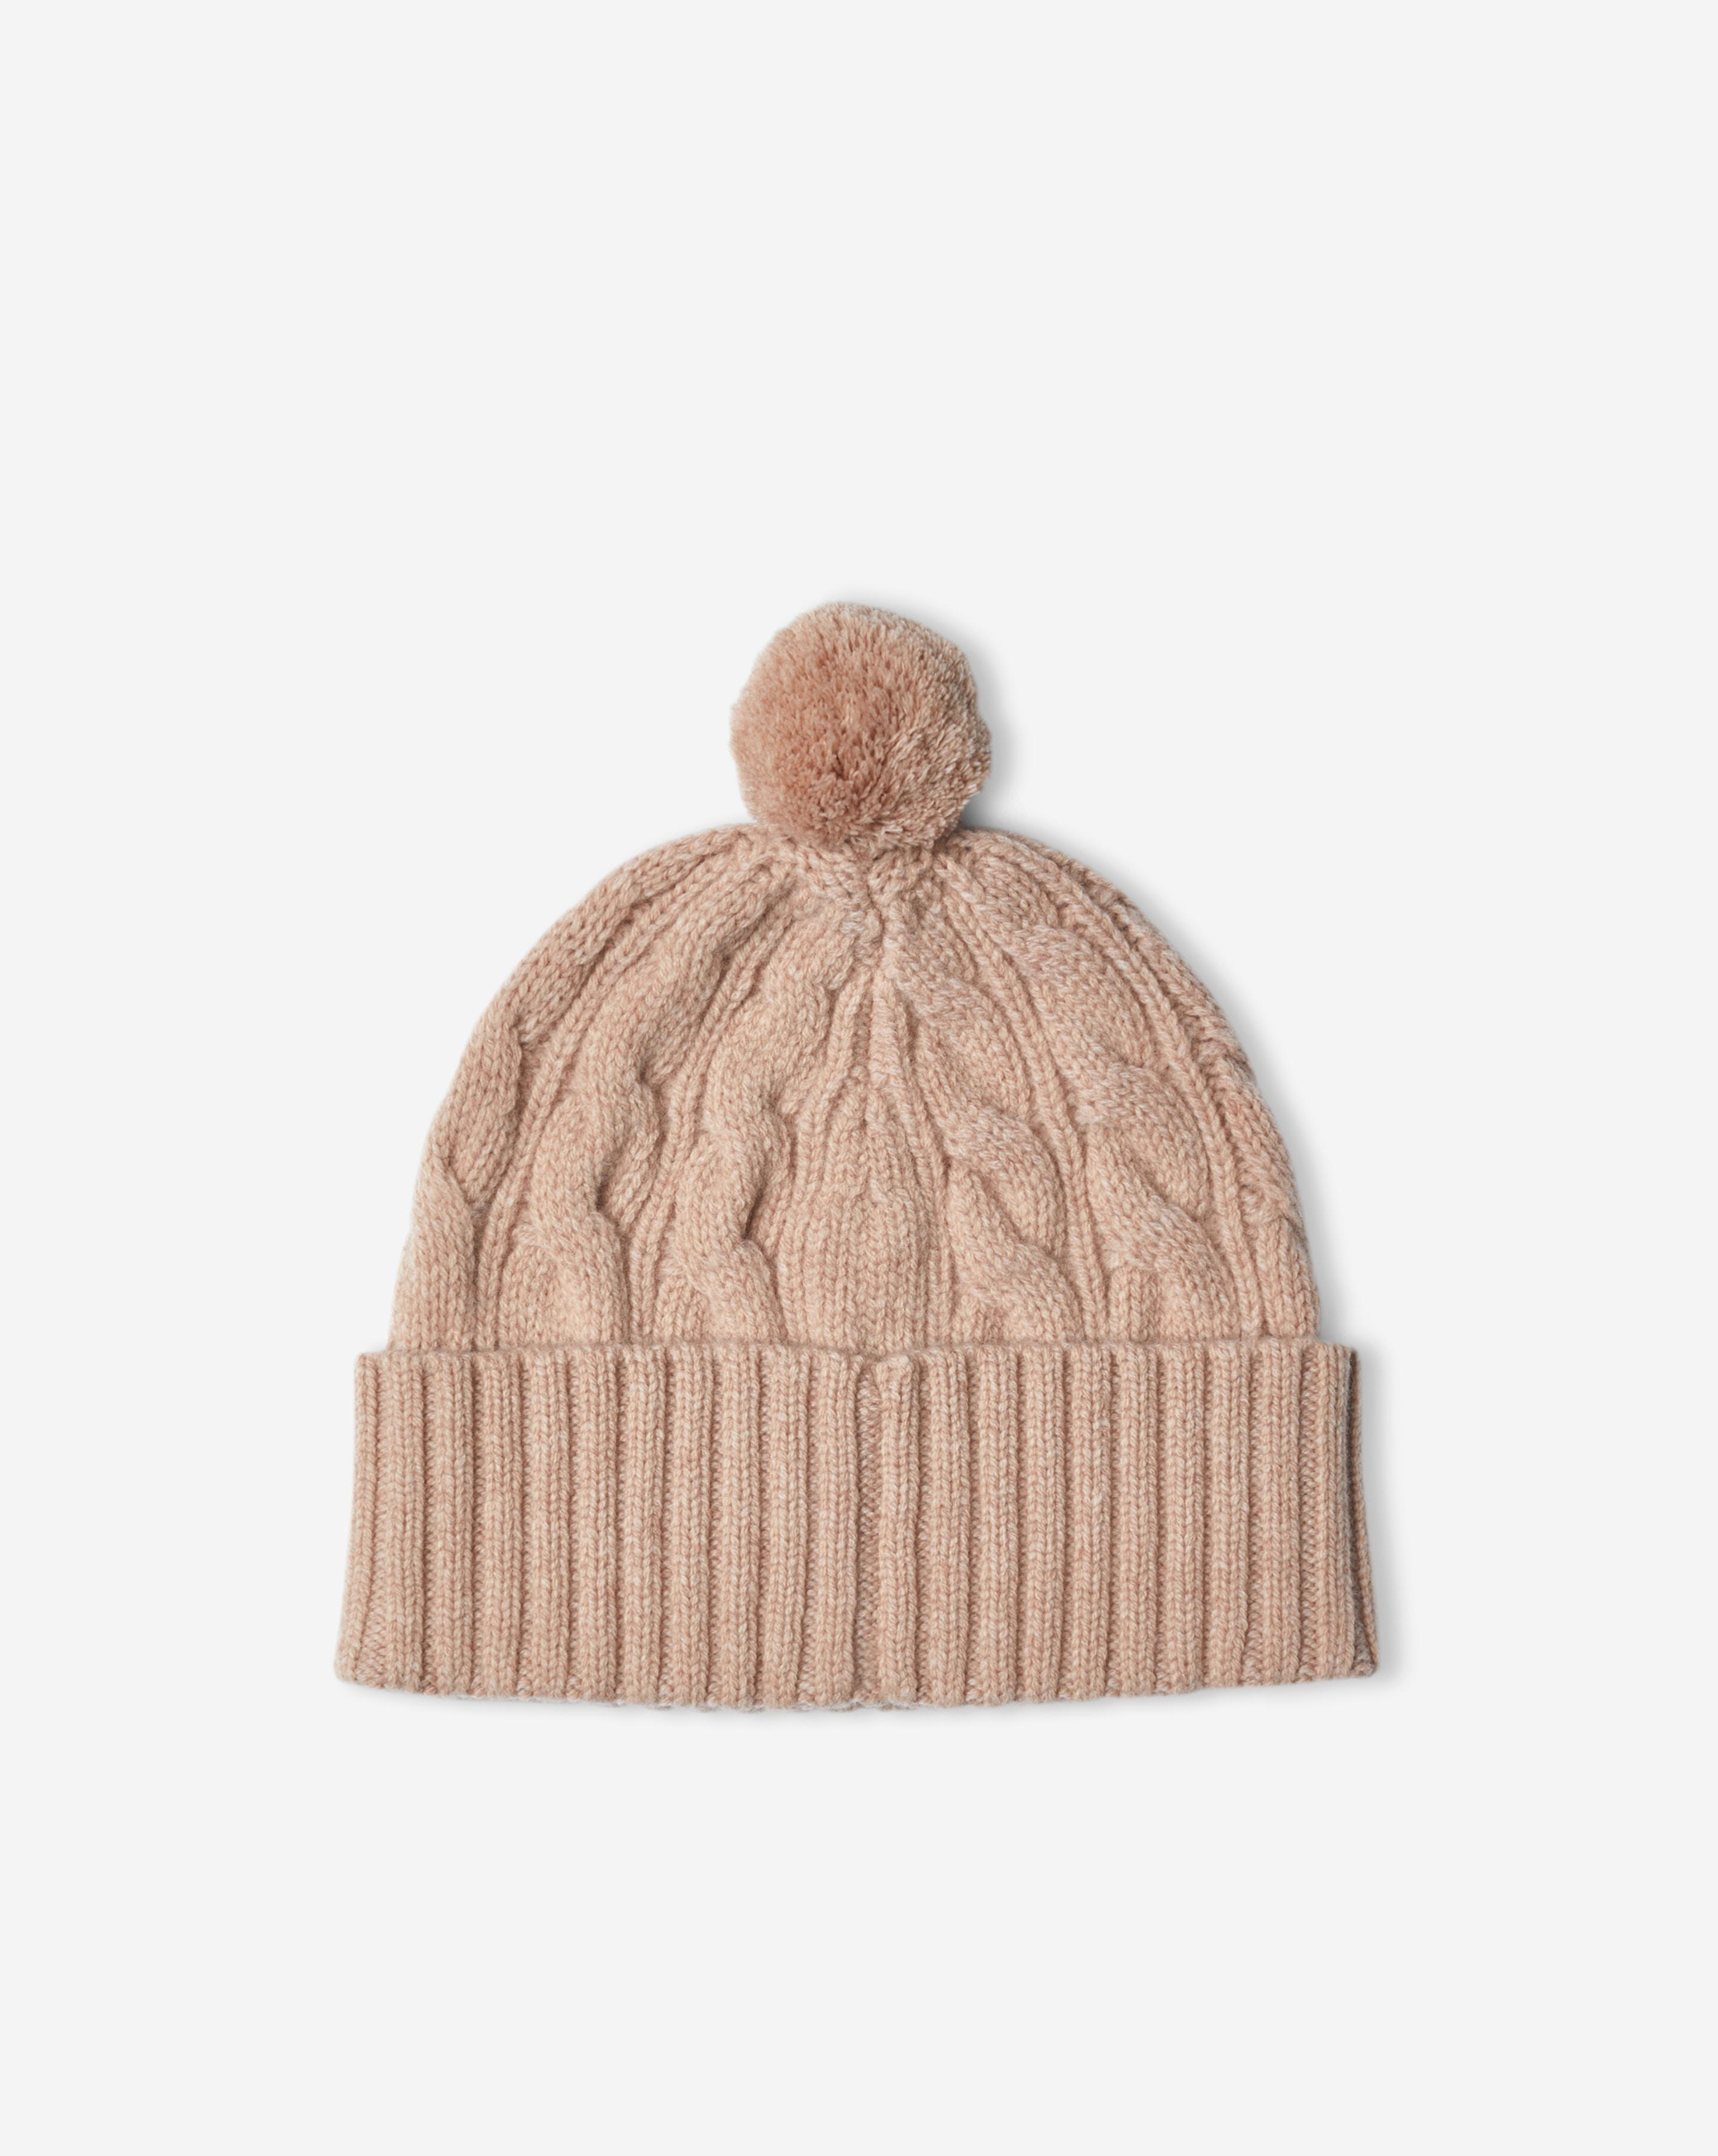 c55eb8c0220a6e Filippa K Braided Hat Blush Melange - Lyst